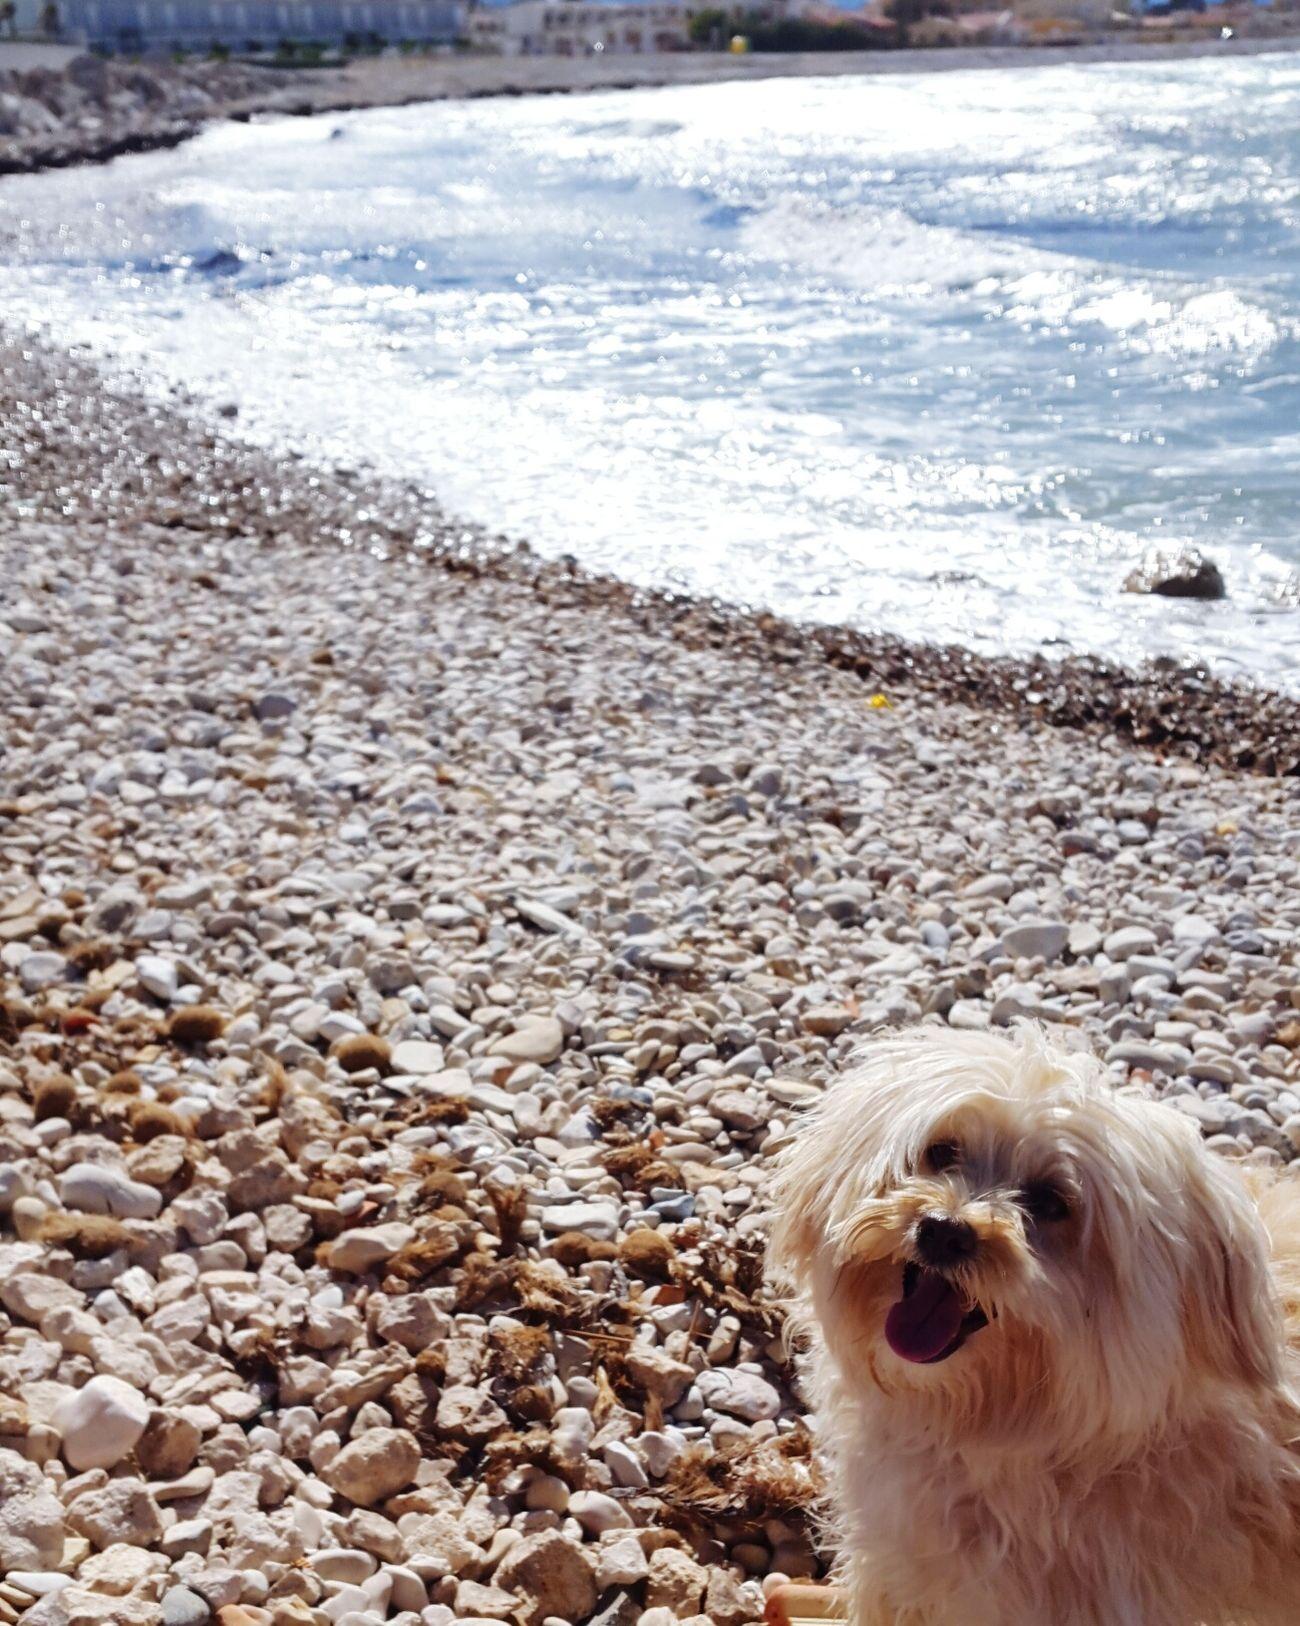 Mydog♡ Beach Summercomealready SPAIN Caneli Today ♥